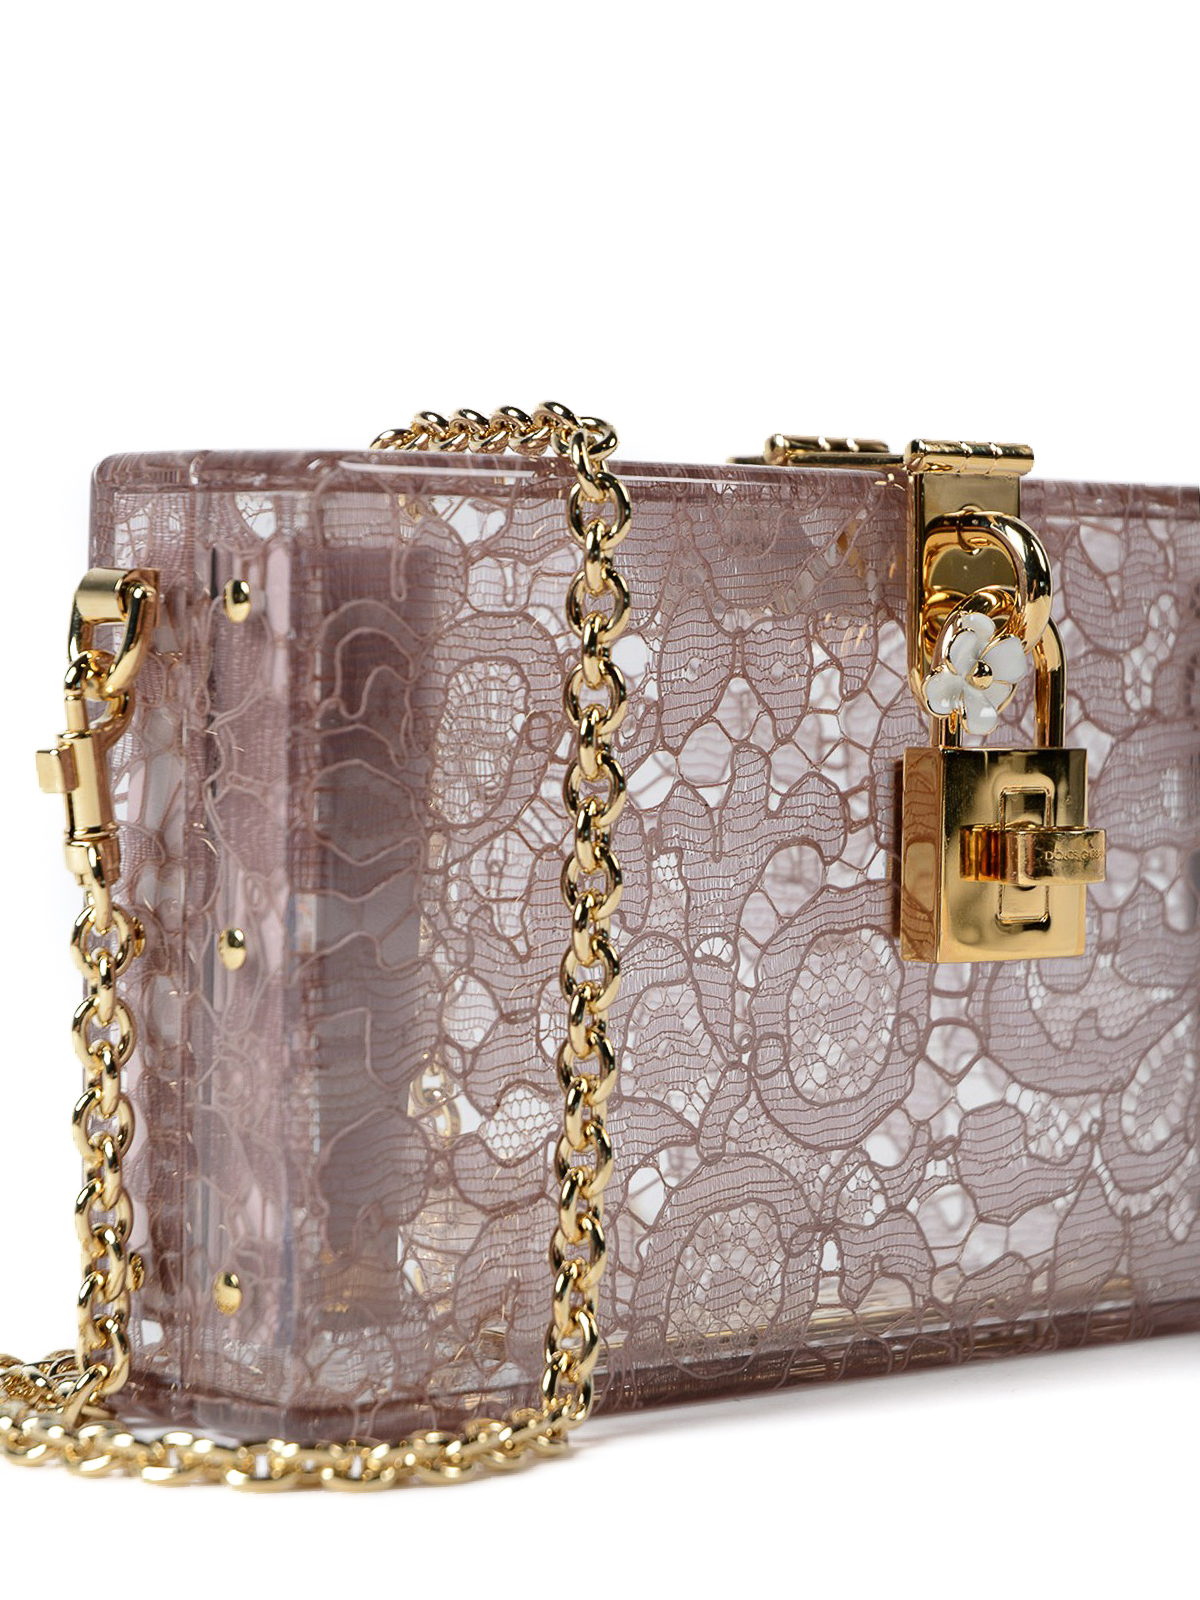 0d94770d79 Dolce & Gabbana - Dolce Box plexi and lace clutch - clutches ...